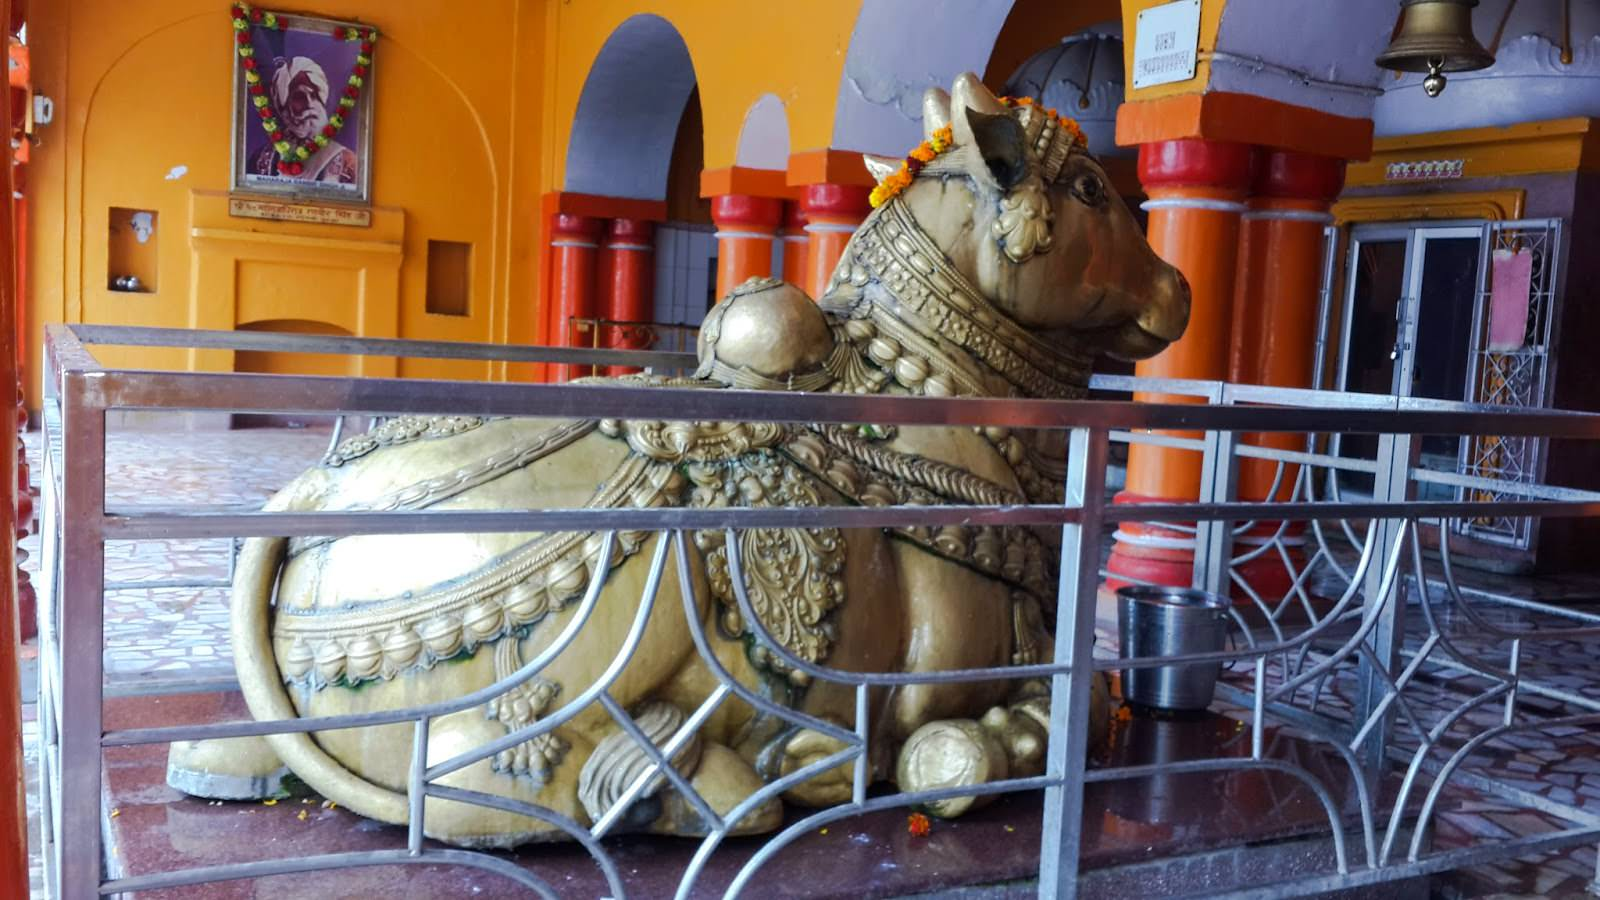 punyadarshan, punya, darshan, India, mandir, temple, About Ranbireshwar temple in Jammu, Ranbireshwar temple, Ranbireshwar, Ranbireshwar temple in Jammu, temple in Jammu, dham, religious, spirituality, Lord shiva, History of Ranbireshwar temple, temple history, The significance of Ranbireshwar temple, significance of Ranbireshwar temple, temple significance, How to reach Ranbireshwar temple in Jammu, How to reach Jammu